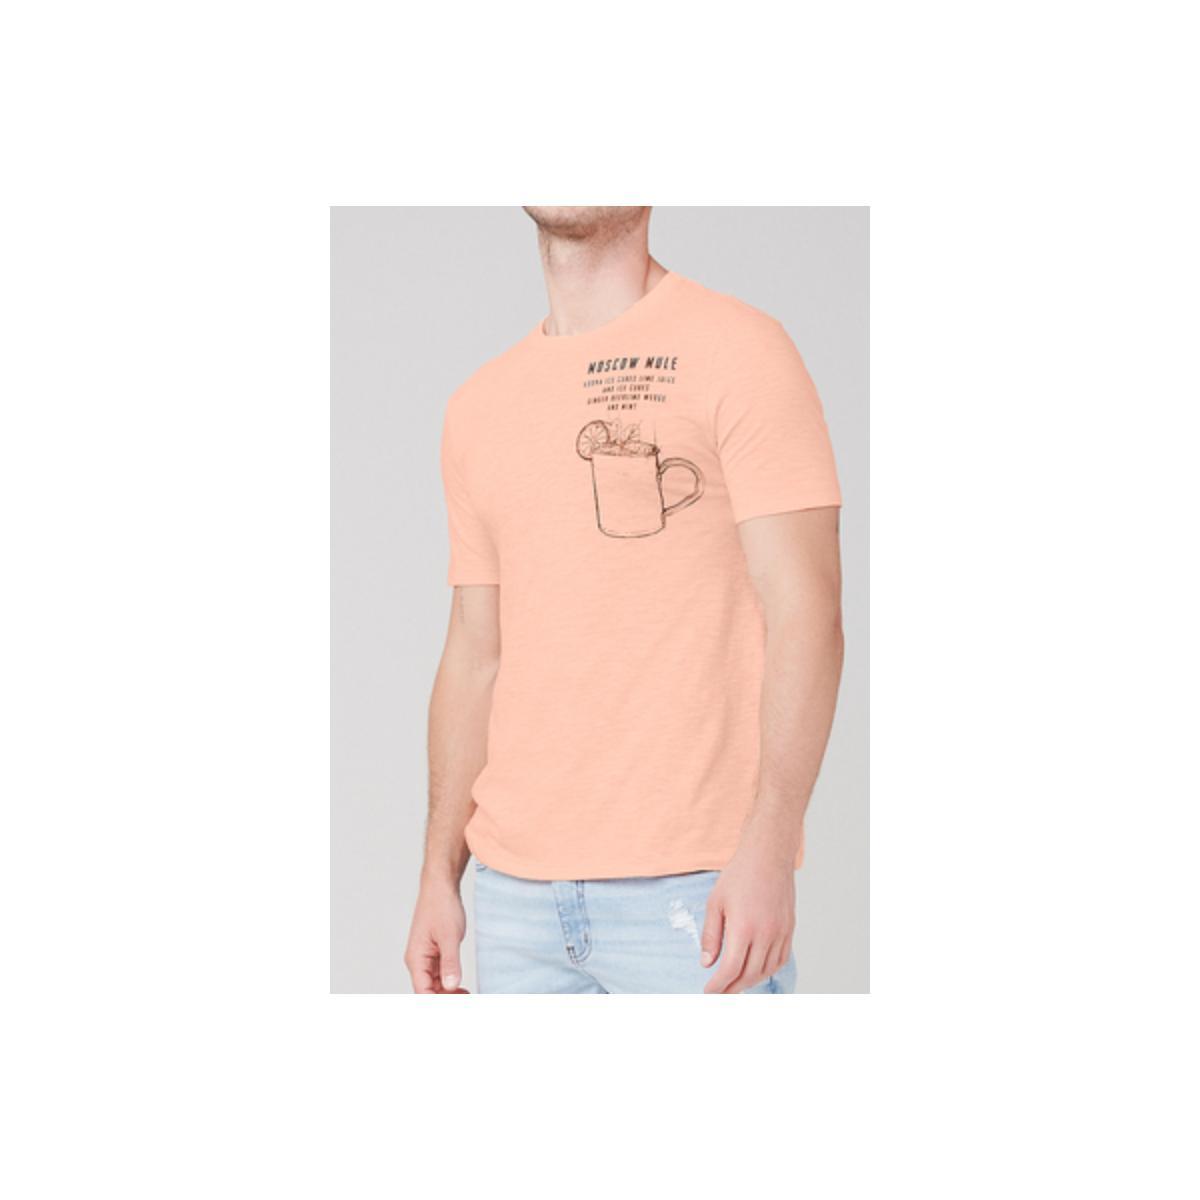 Camiseta Masculina Dzarm 6r7m Ldlen Pêssego